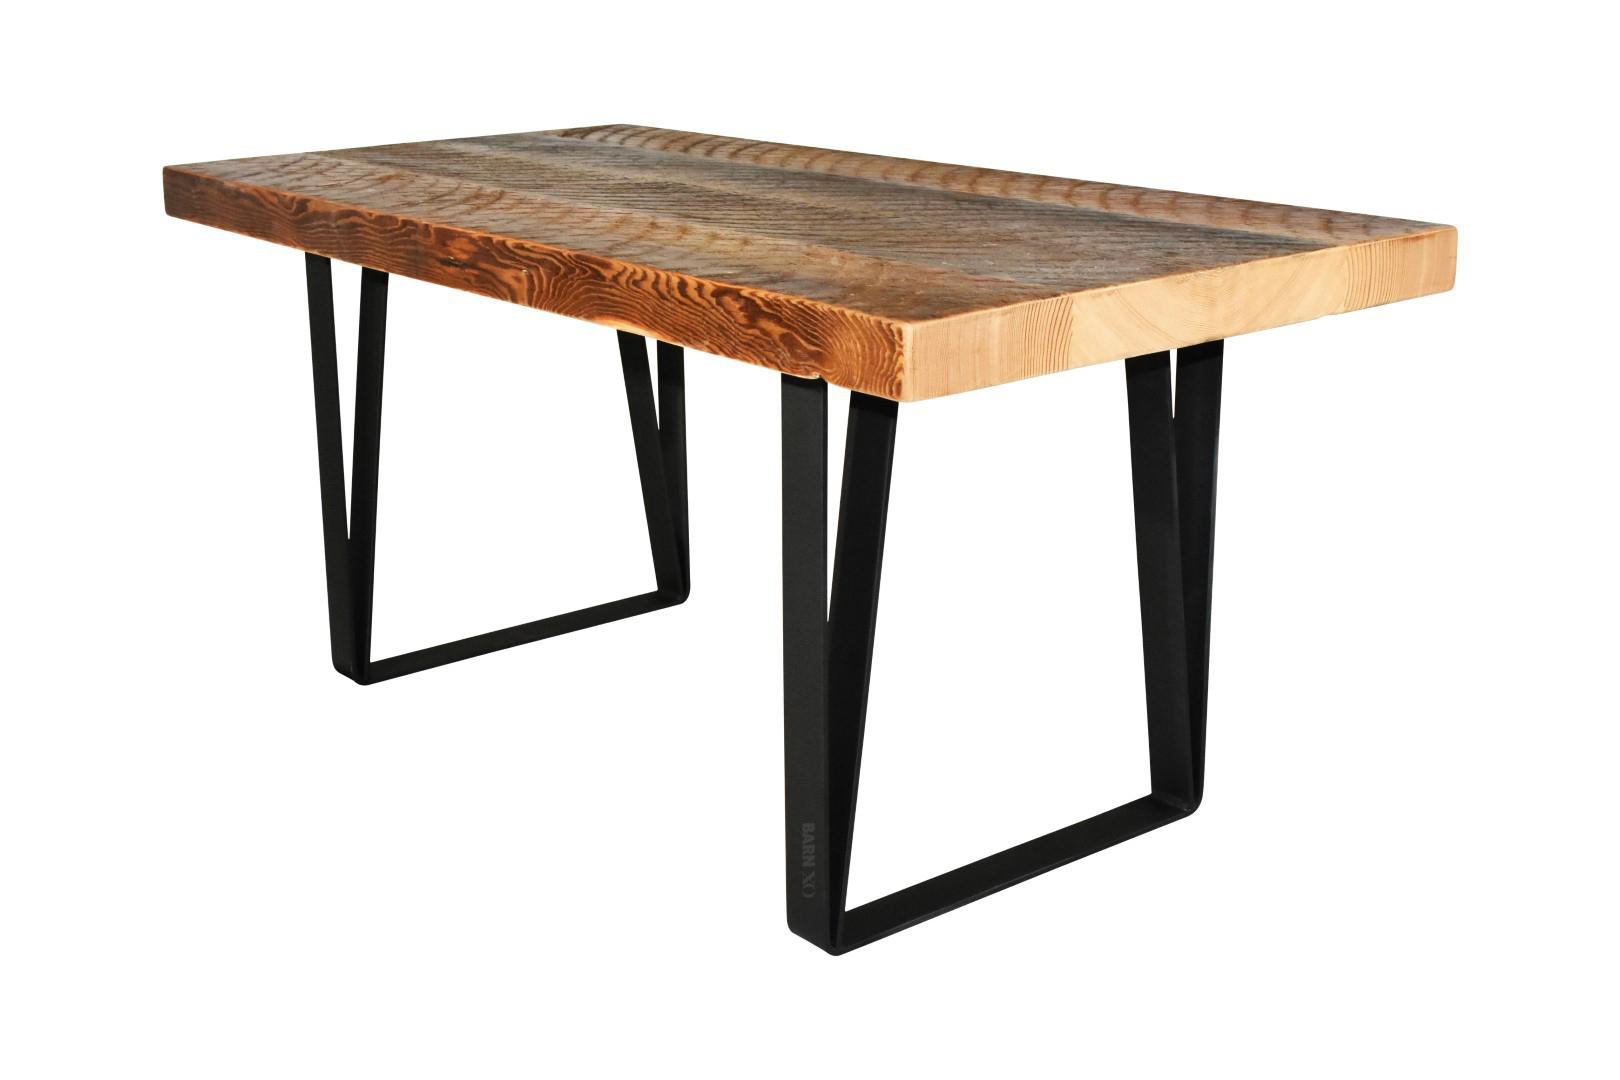 Repurposed Wooden Furniture Barnwood Furnishings Salvaged